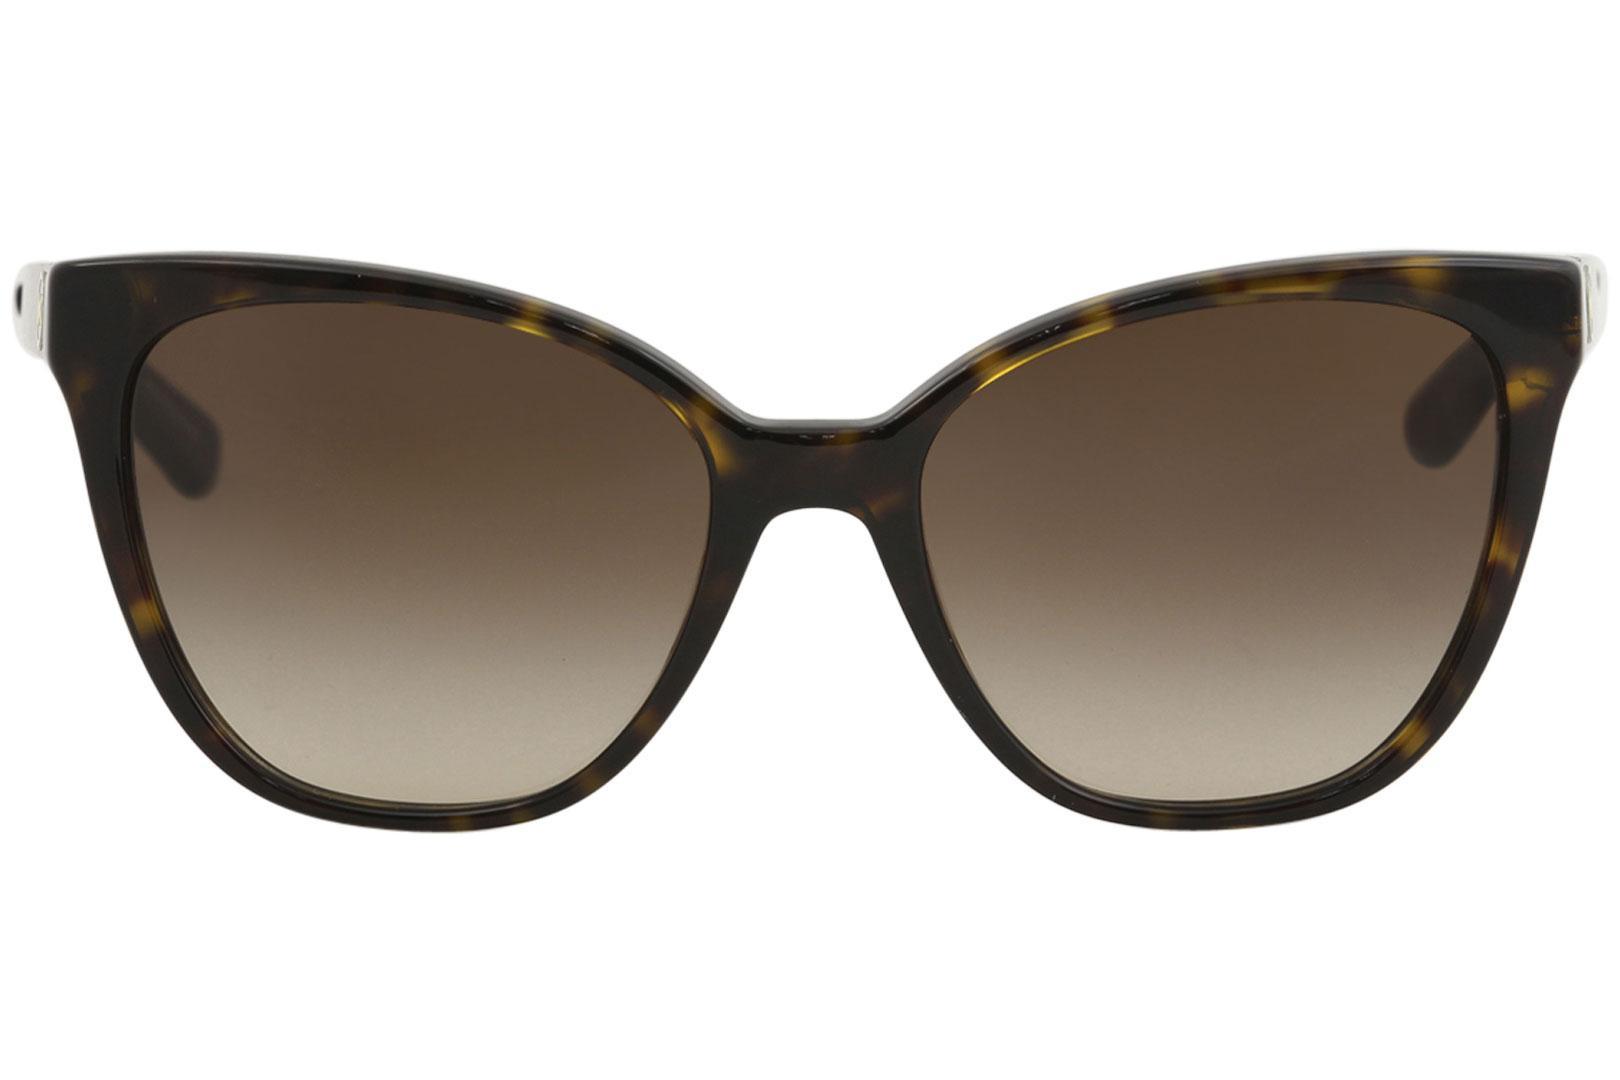 56929a1936240 Michael Kors Women s Napa MK2058 MK 2058 Fashion Cat Eye Sunglasses by Michael  Kors. 12345